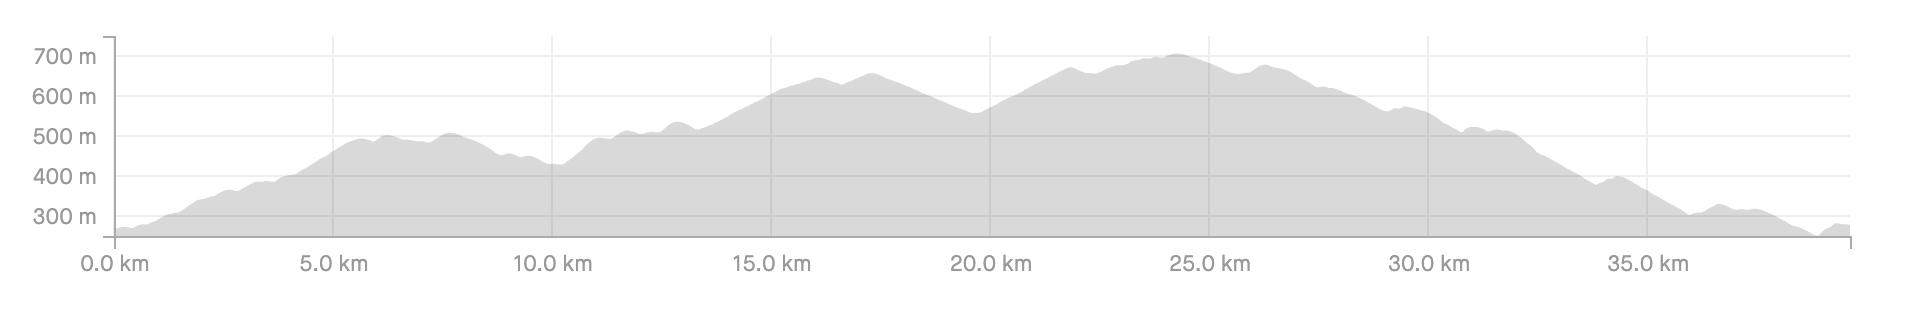 EC Loop hill profile